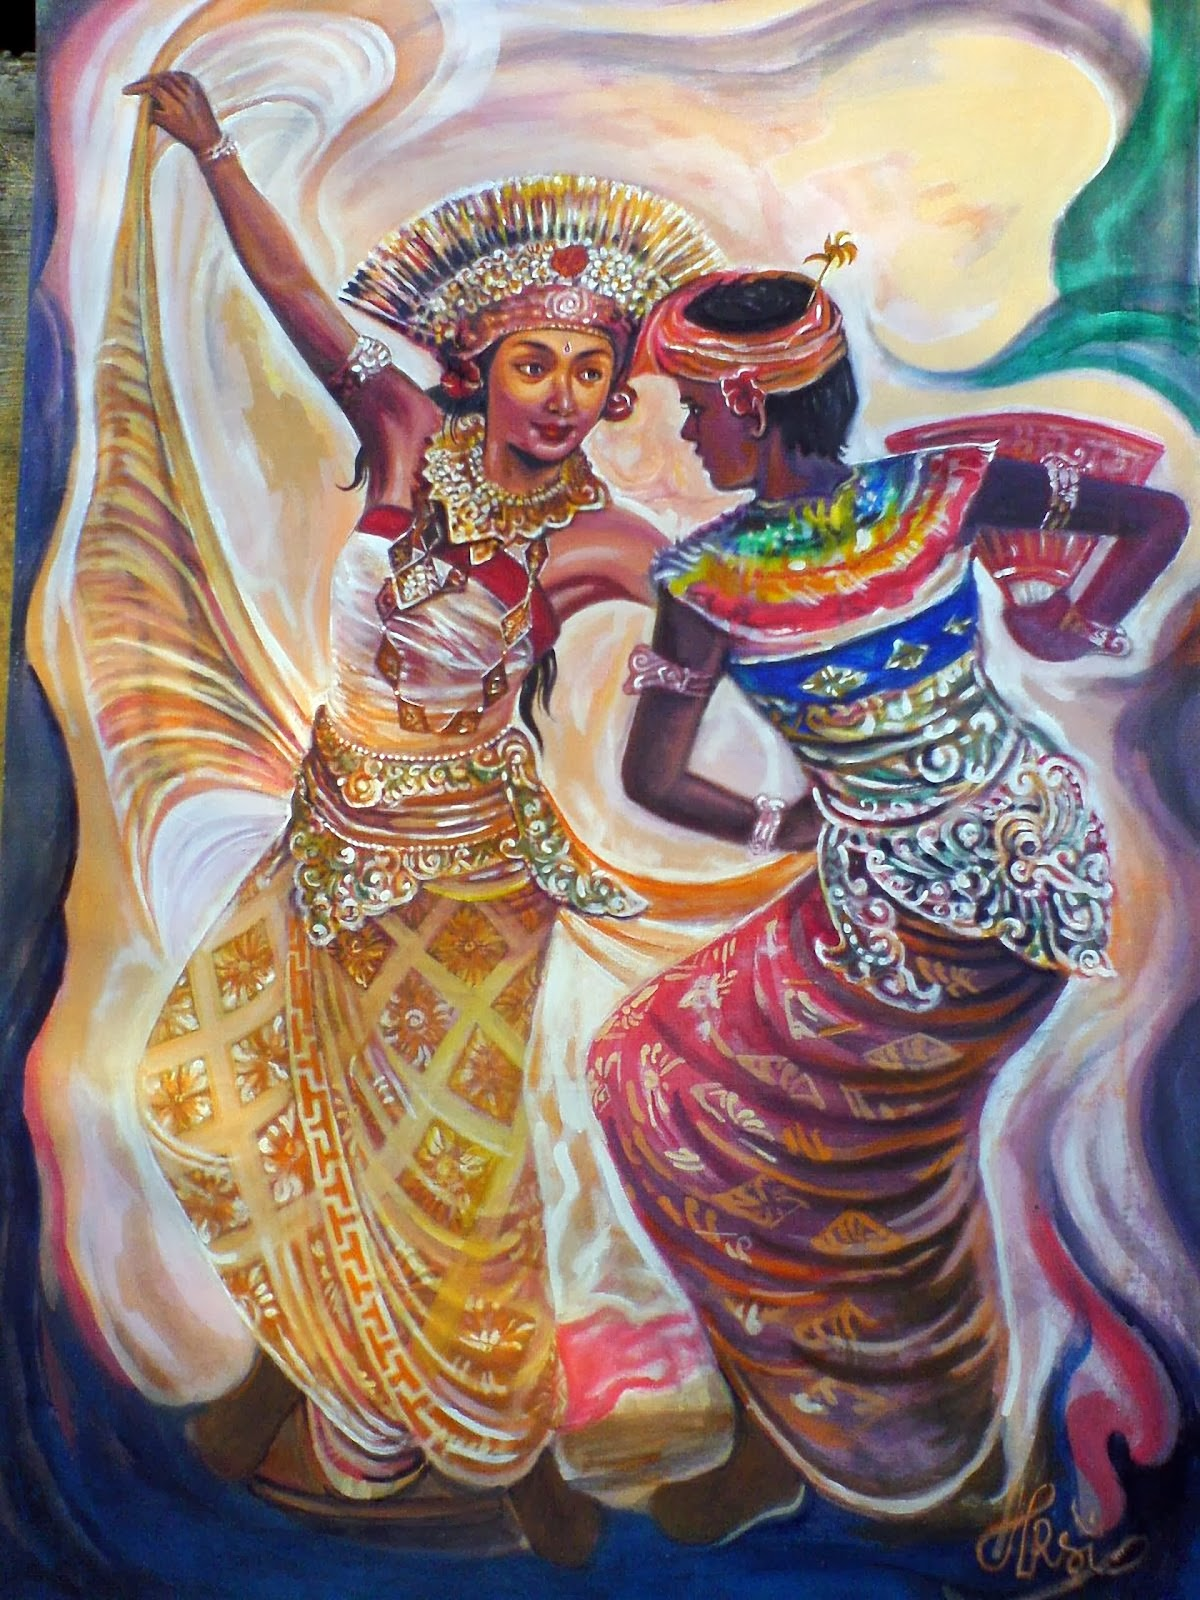 28 Karya Lukisan Tarian Bali yang Artistik  Seni Rupa